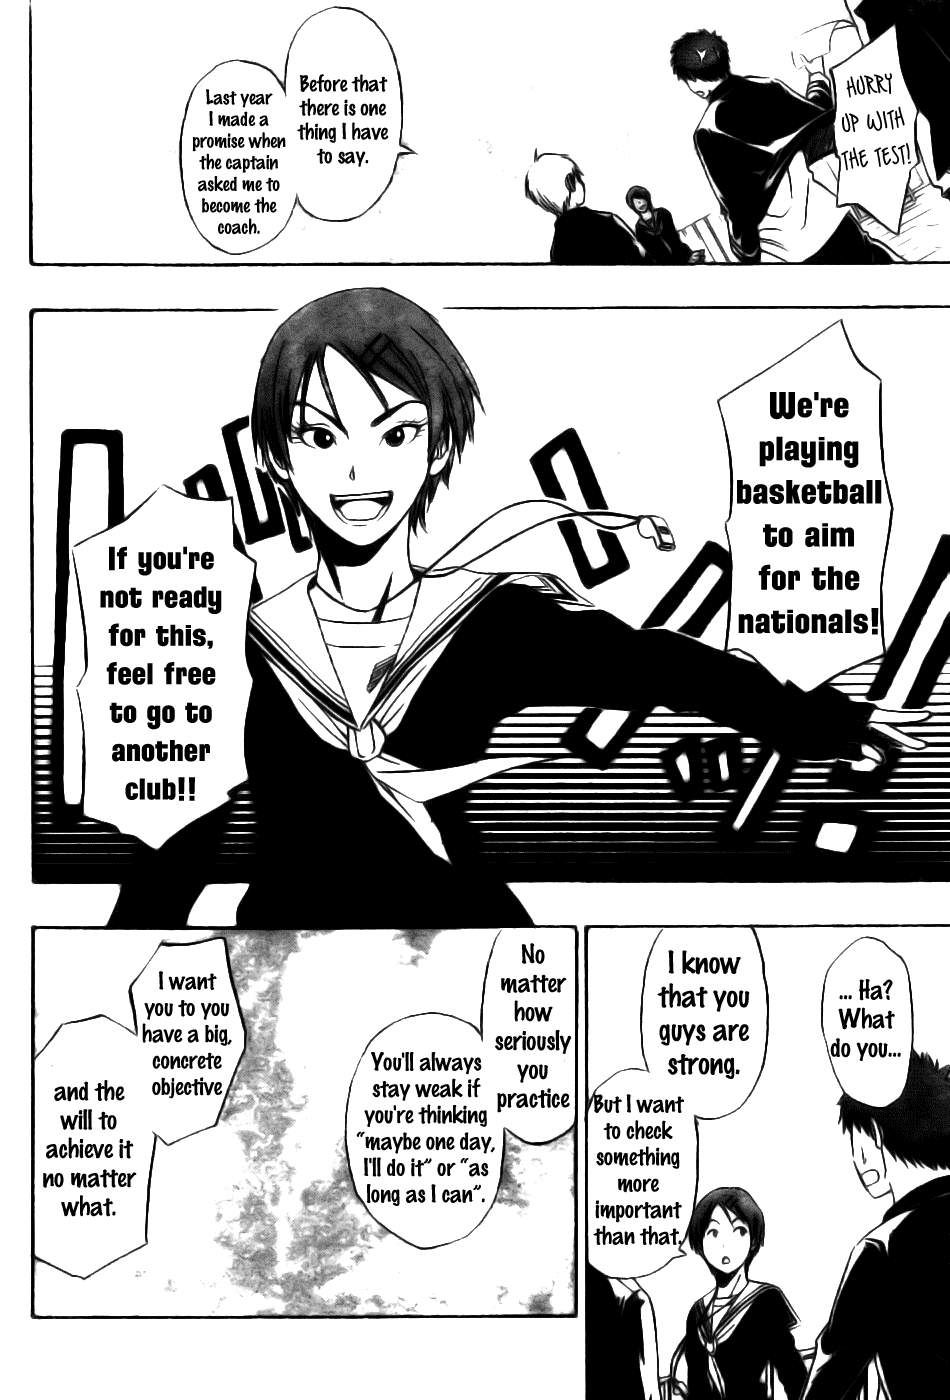 Kuruko no Basket Chapter 2 - Image 5D-12